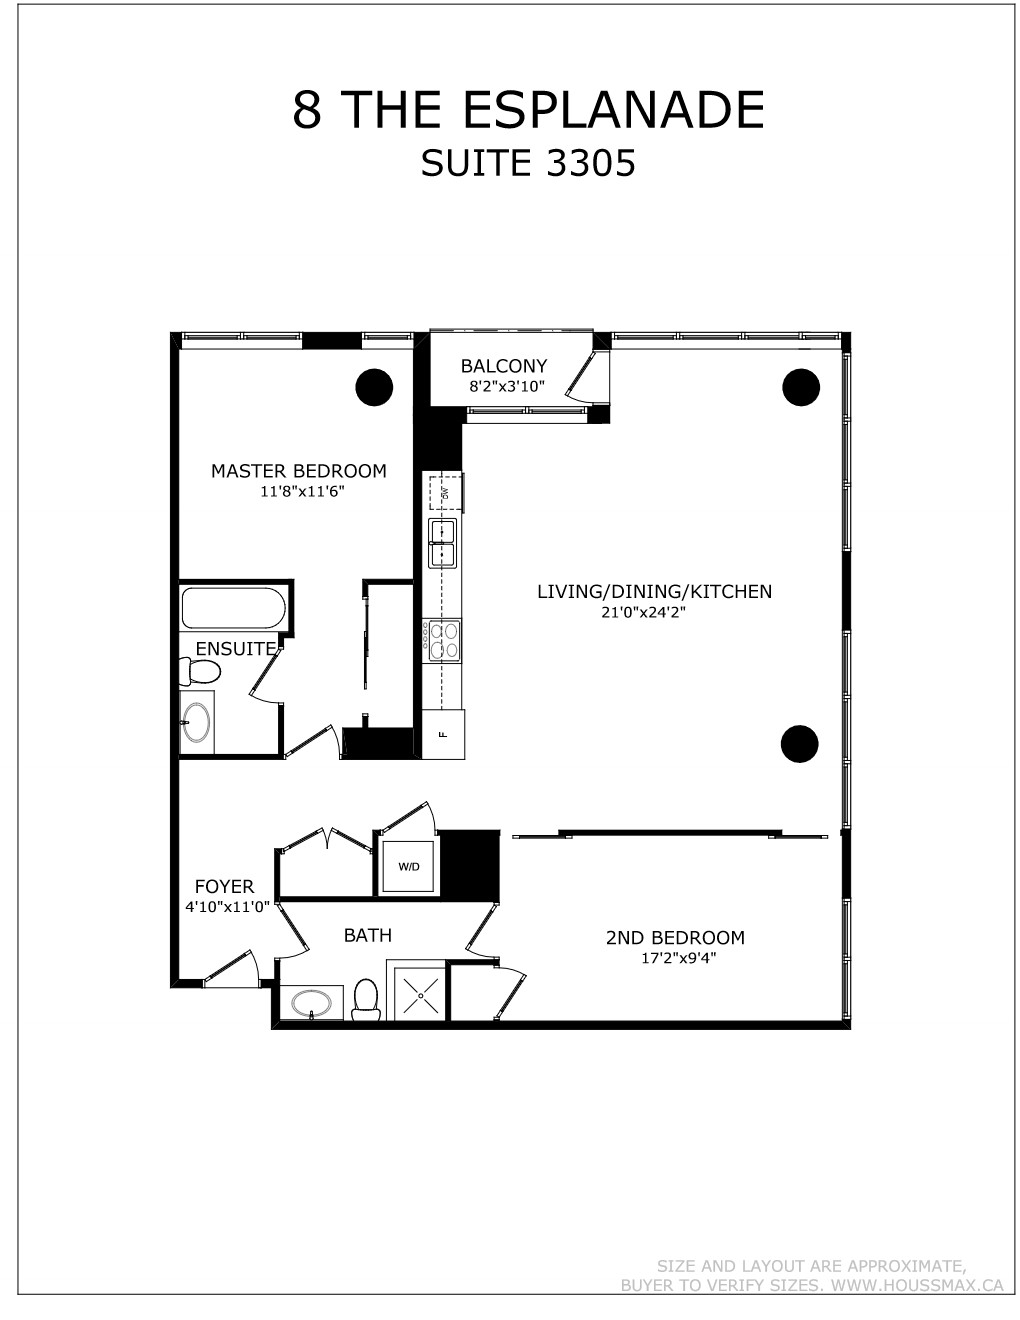 8 The Esplanade Street Unit 3305 Floor Plan